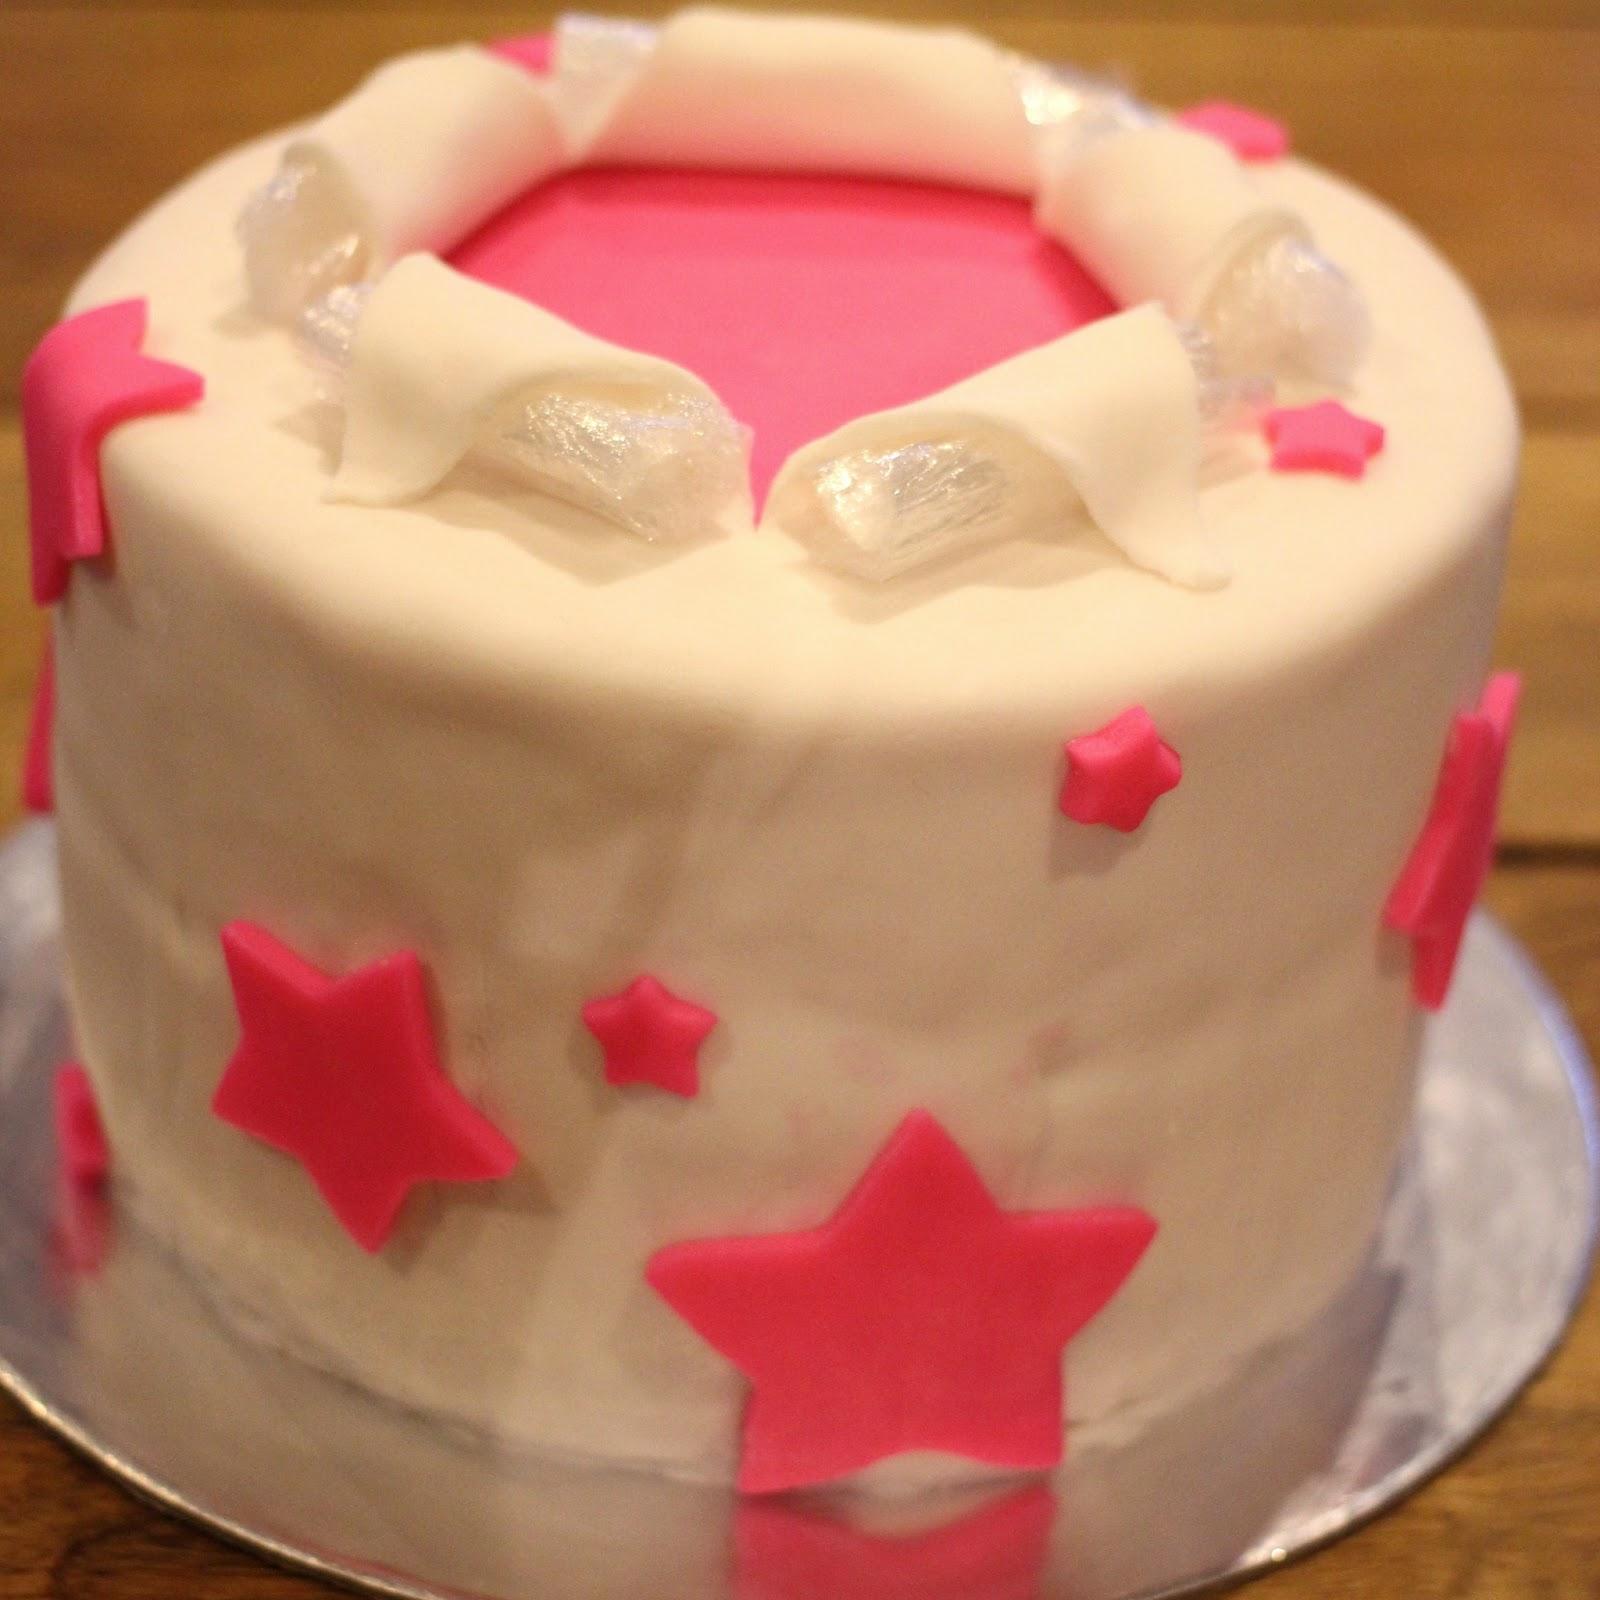 Putting Fondant Over Messy Cake